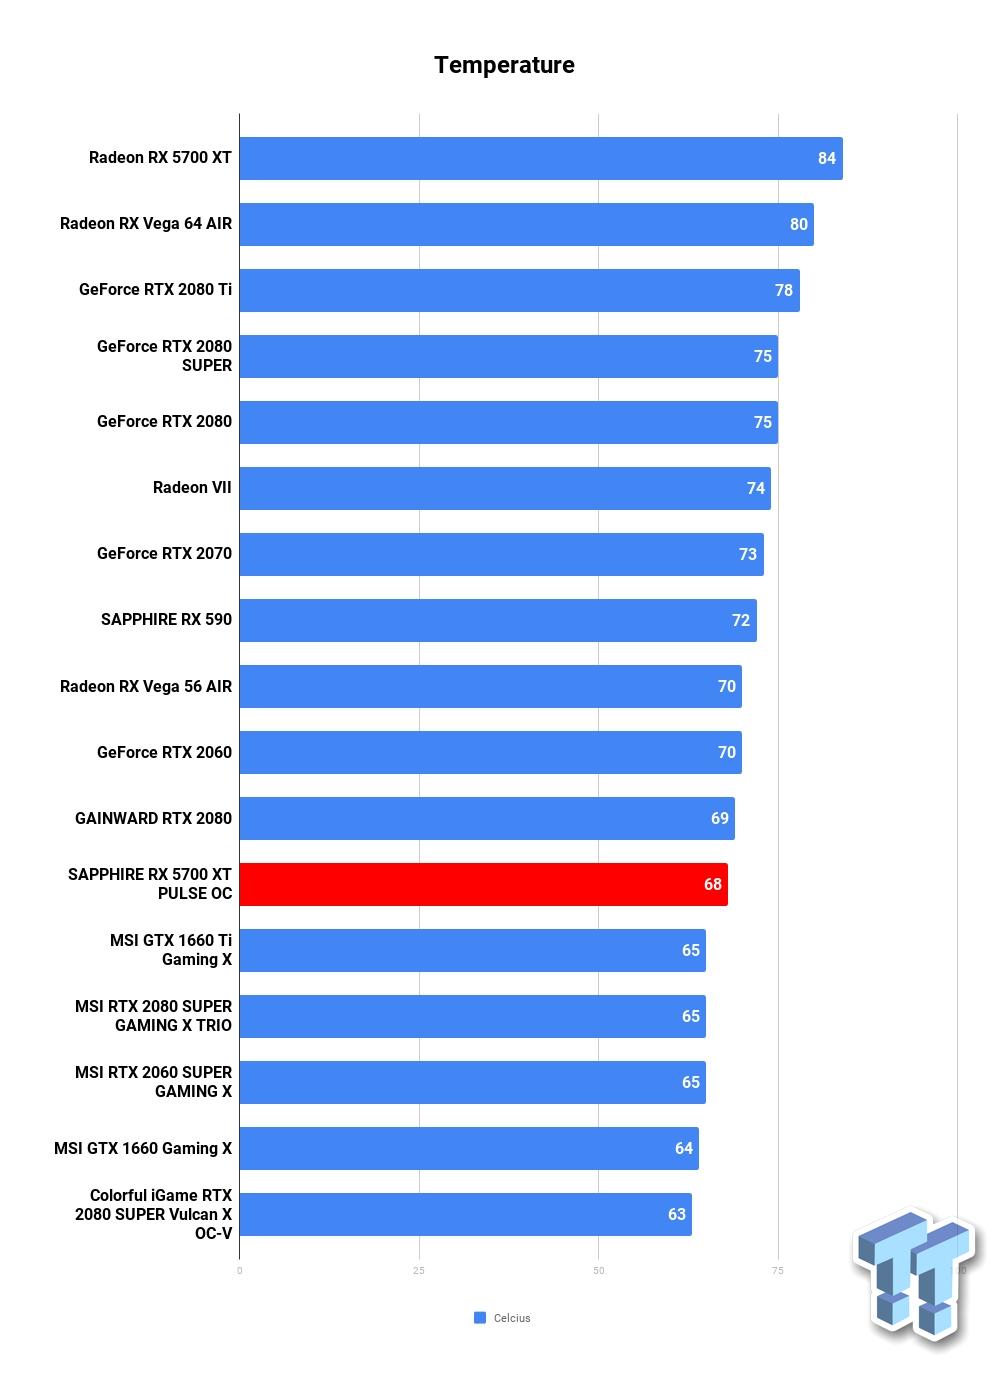 AMD: It's OK that Radeon RX 5700 series cards run at 110C